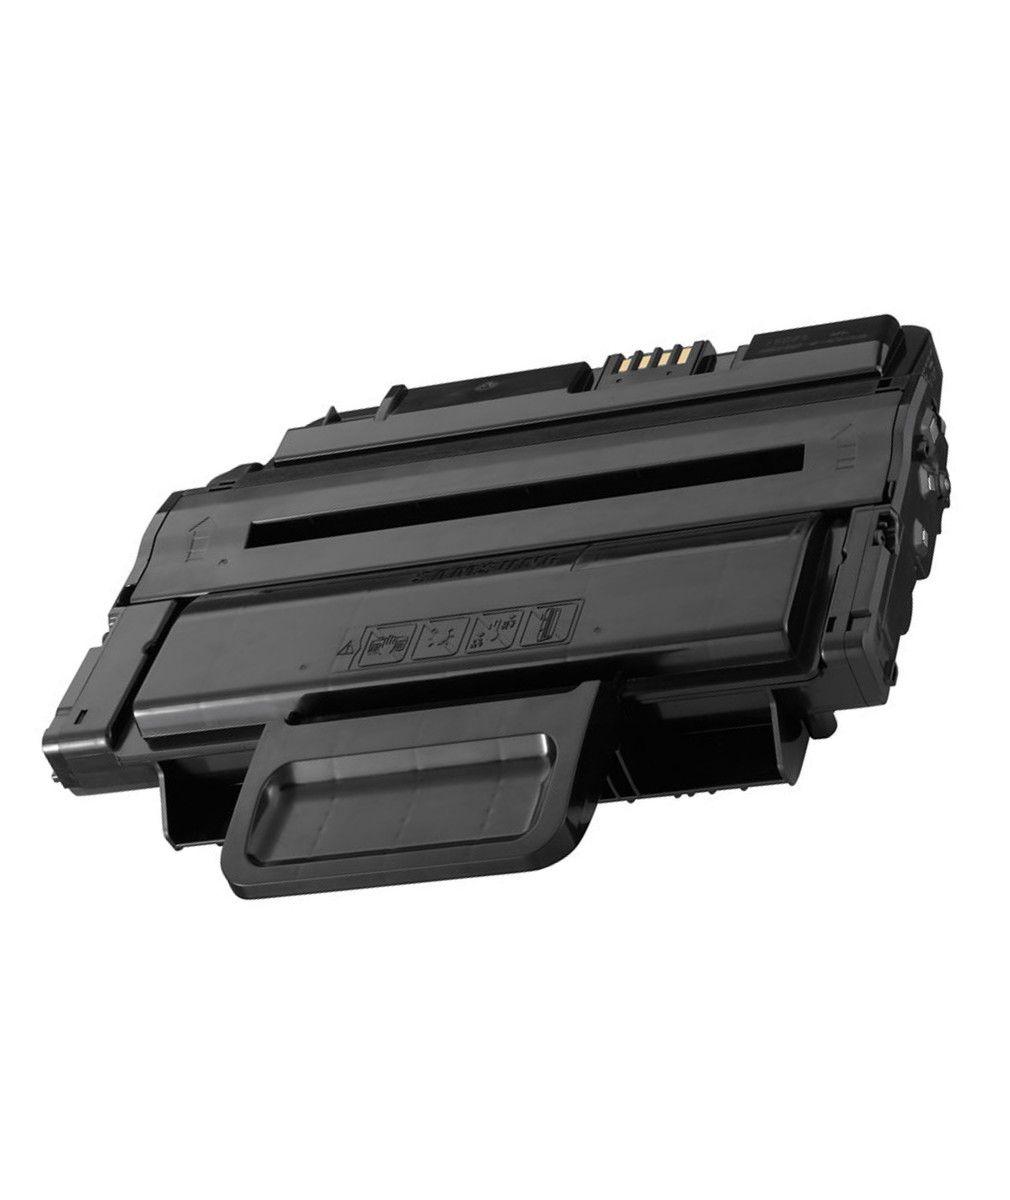 Toner compatível  SAMSUNG ML2850D | ML2850 ML2851 ML2050D ML2851ND ML2851NDL - 5.000 Páginas - Cartucho & Cia